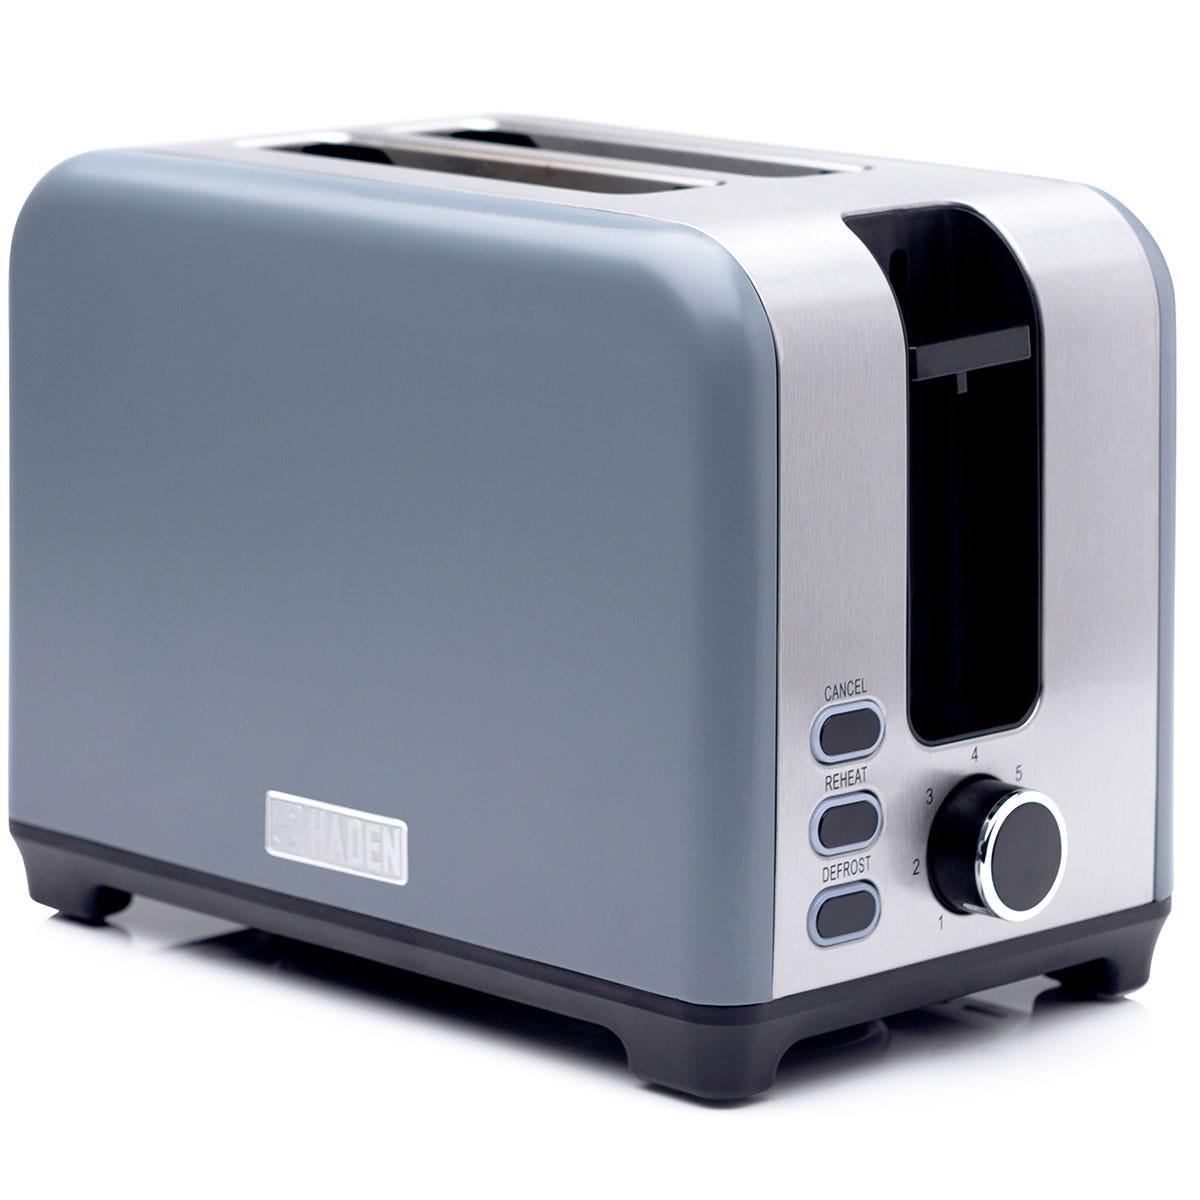 Haden 192929 Hove 2-Slice Toaster- Slate Grey